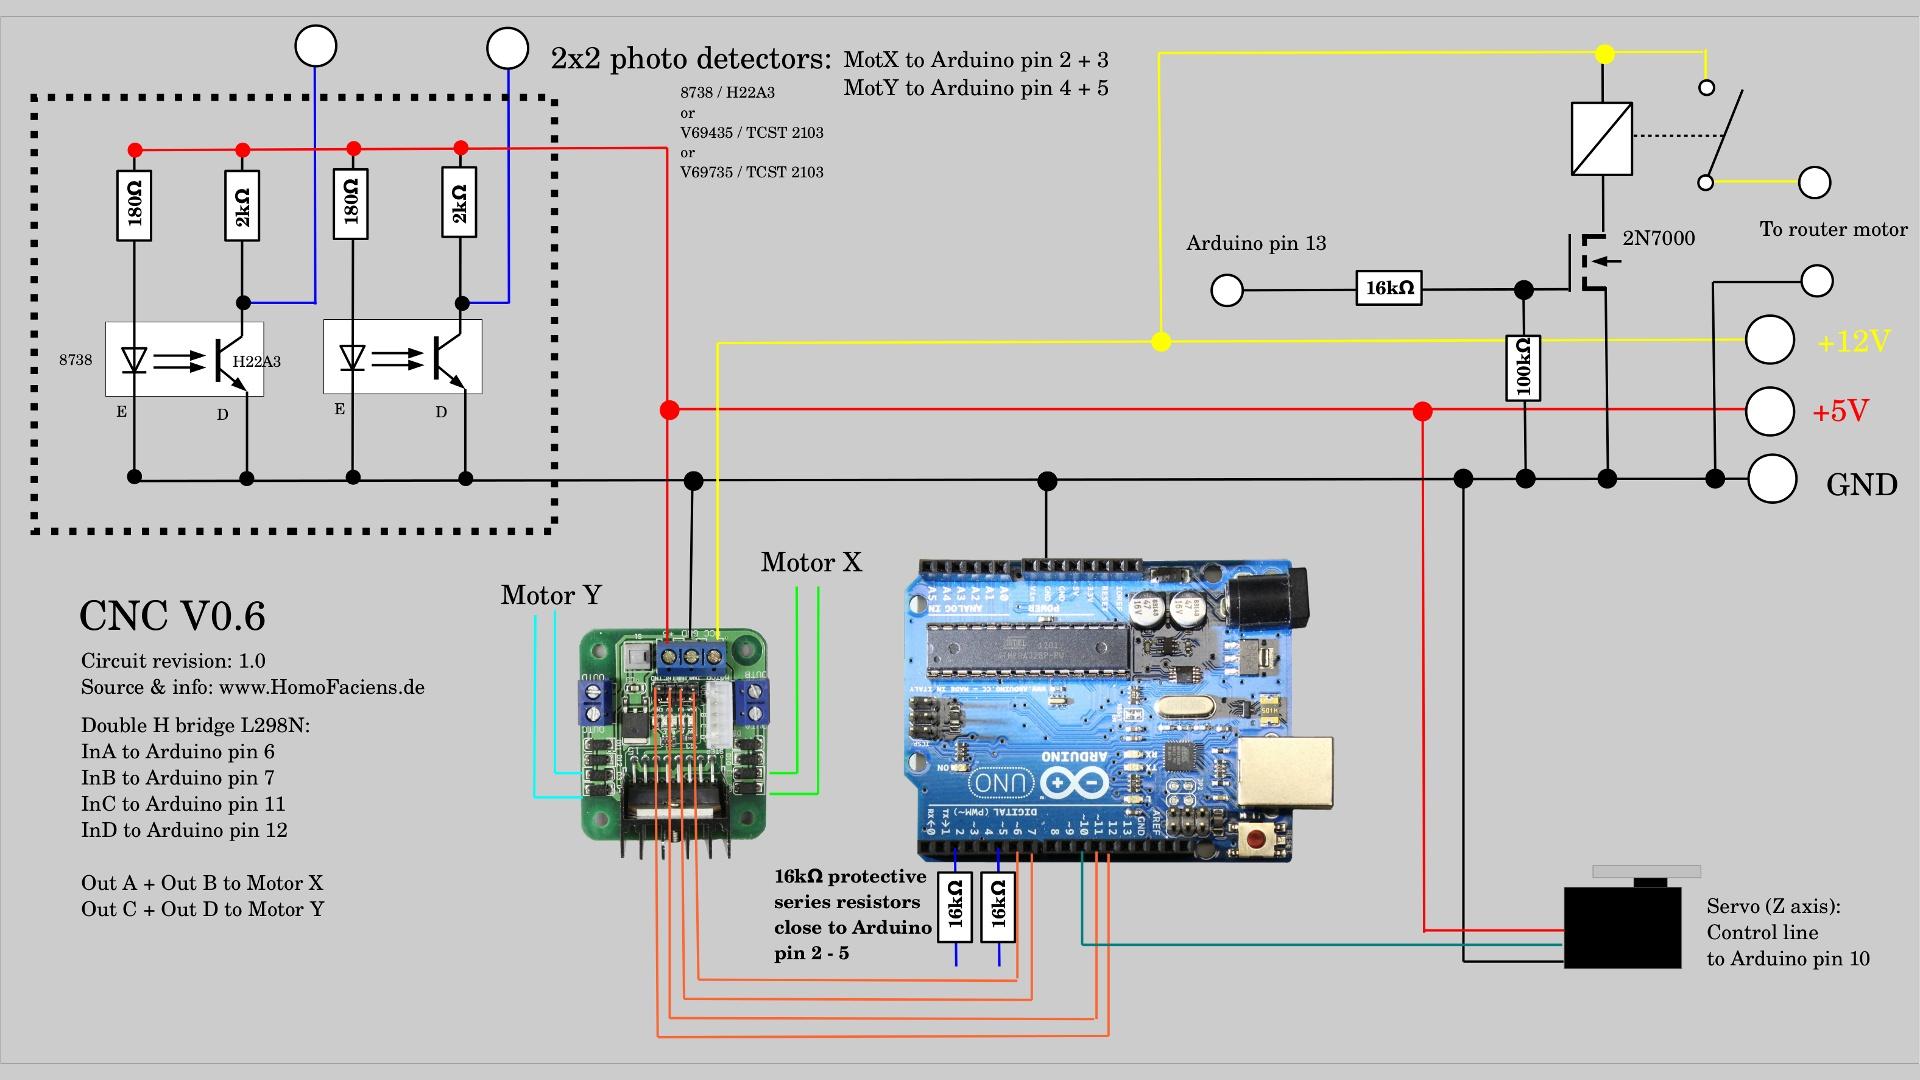 Cnc V0 6 Wiring Diagram